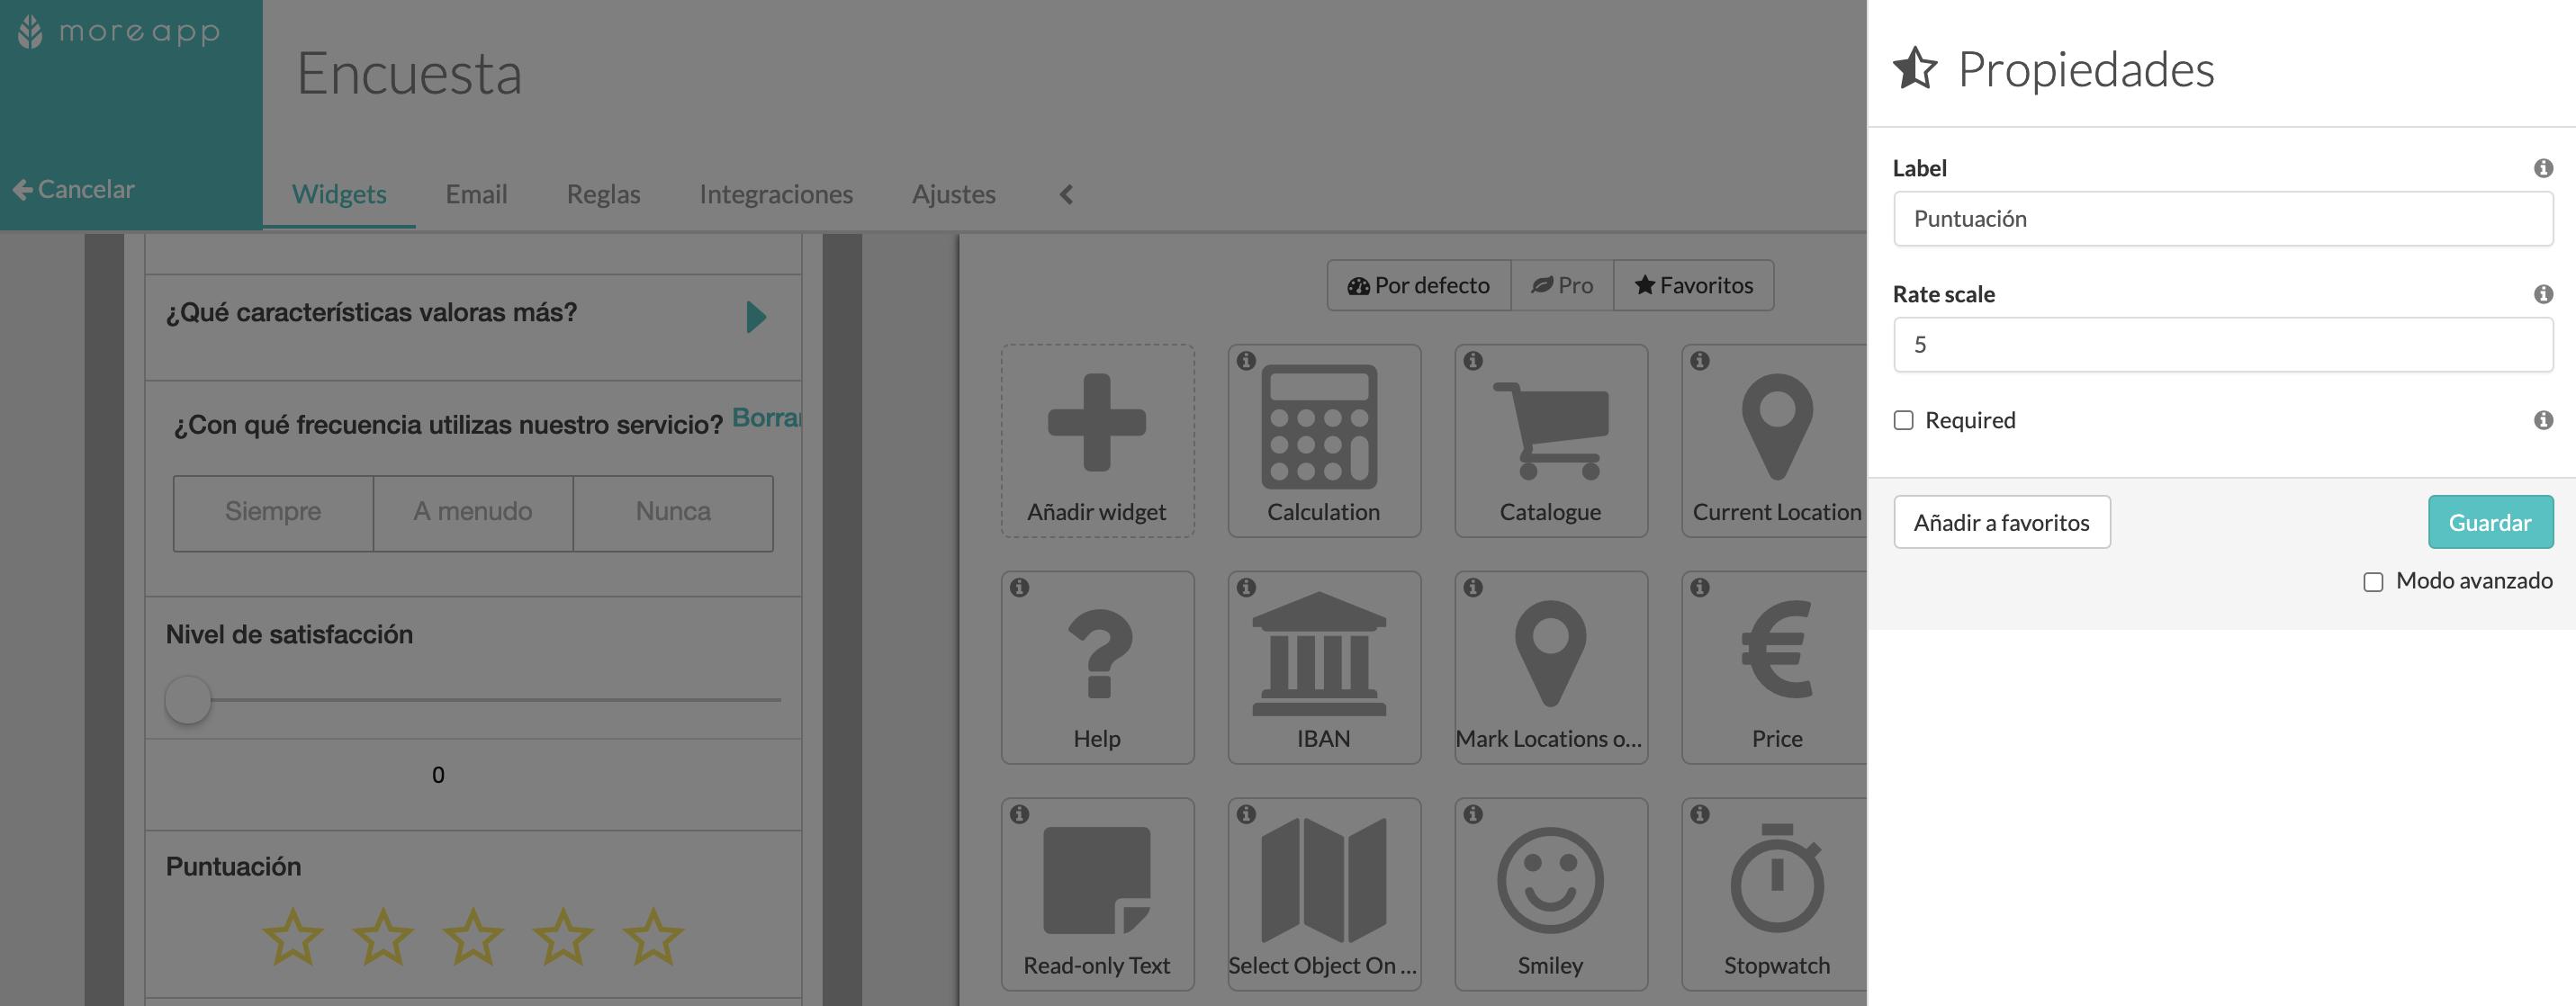 Widget-Rating Plataforma MoreApp